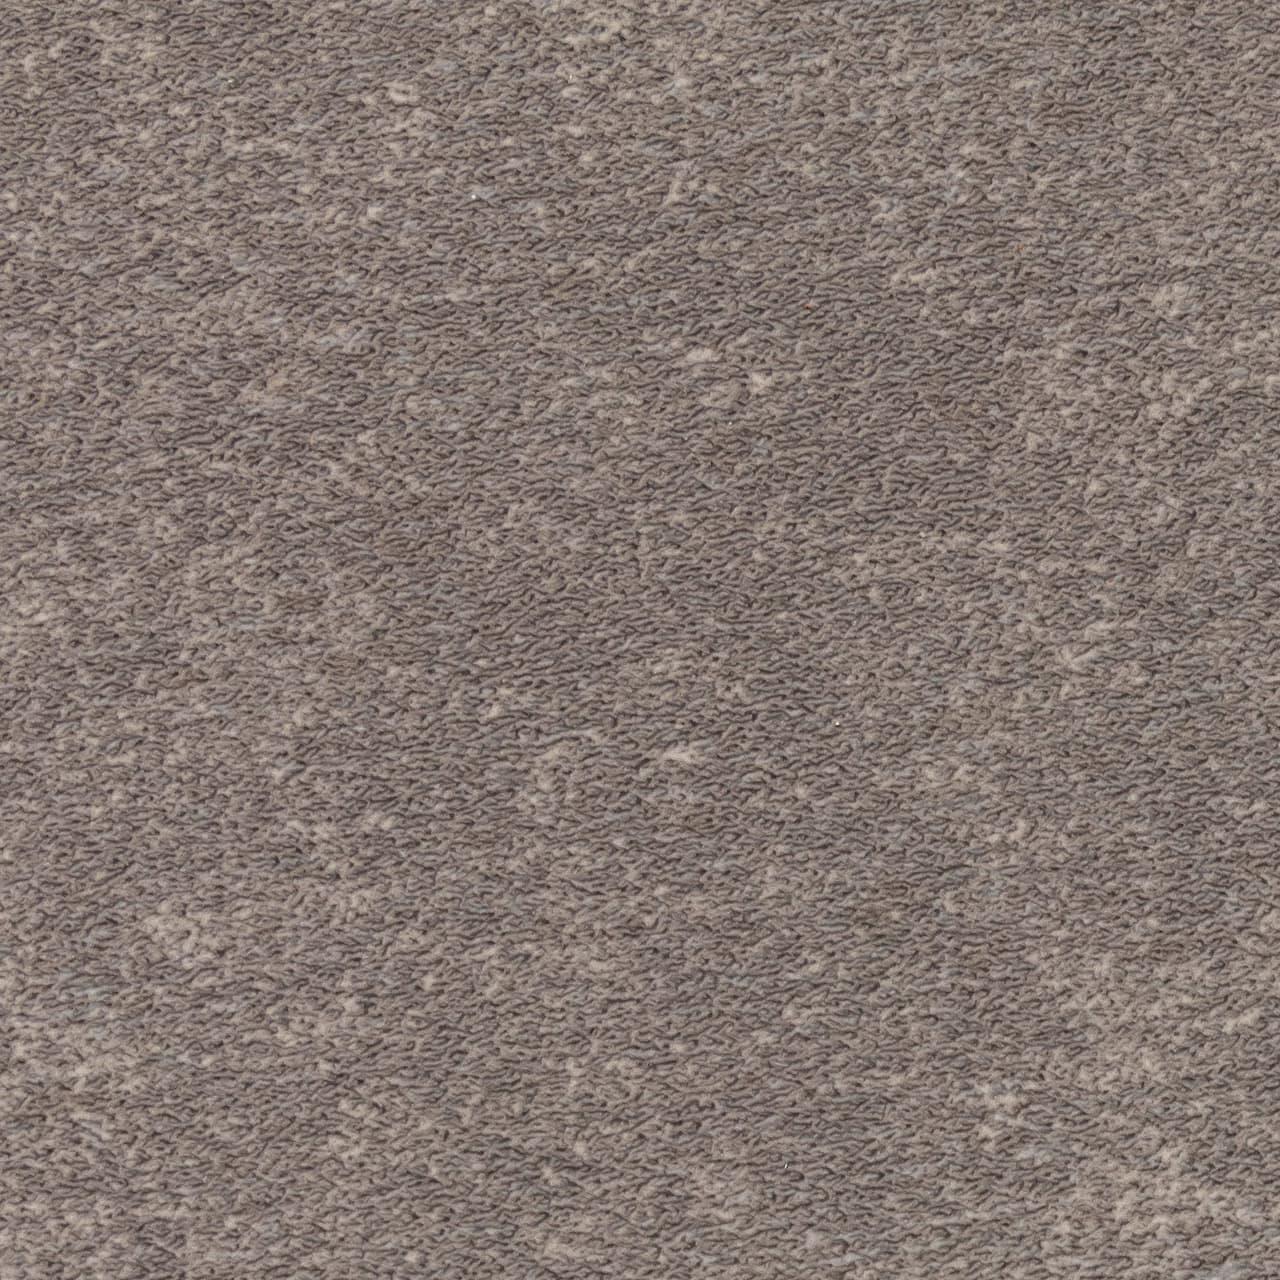 KERAMIK-GLAS Tischplatte 95 x 95 cm